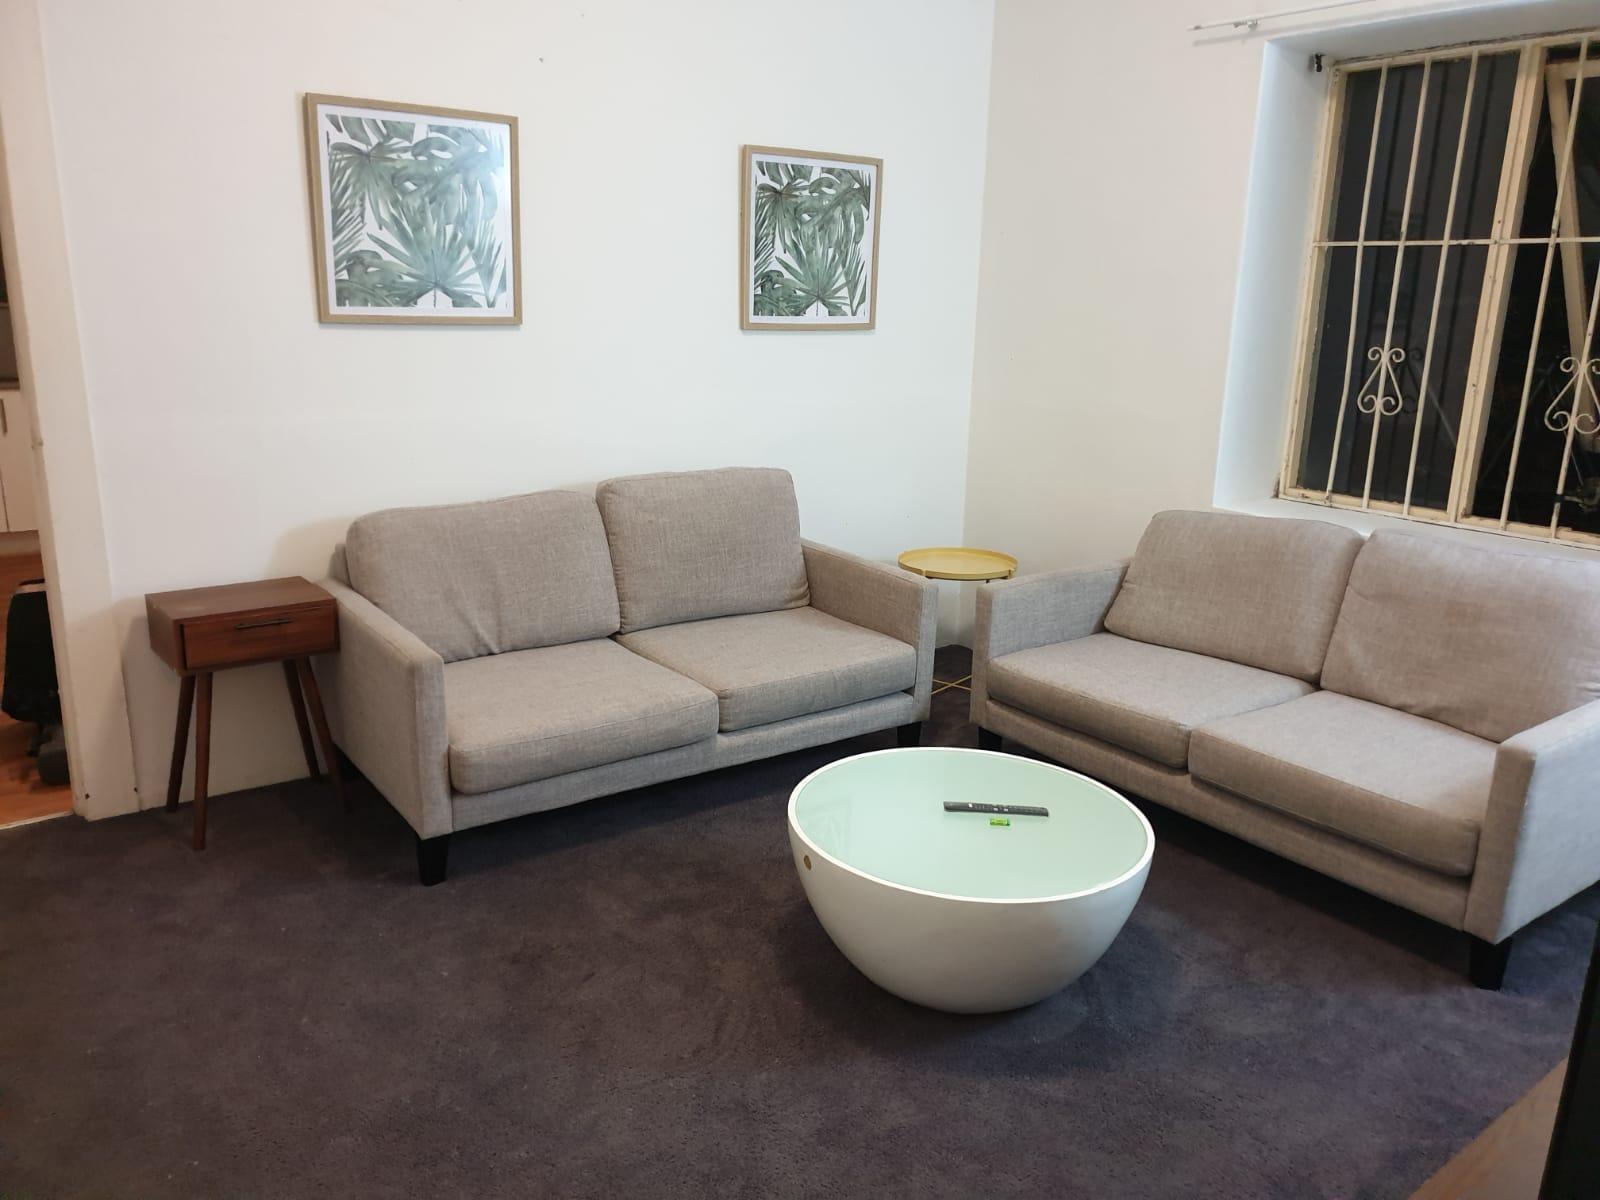 235 Bondi Road, Bondi NSW 2026 - Apartment For Rent - $495 ...